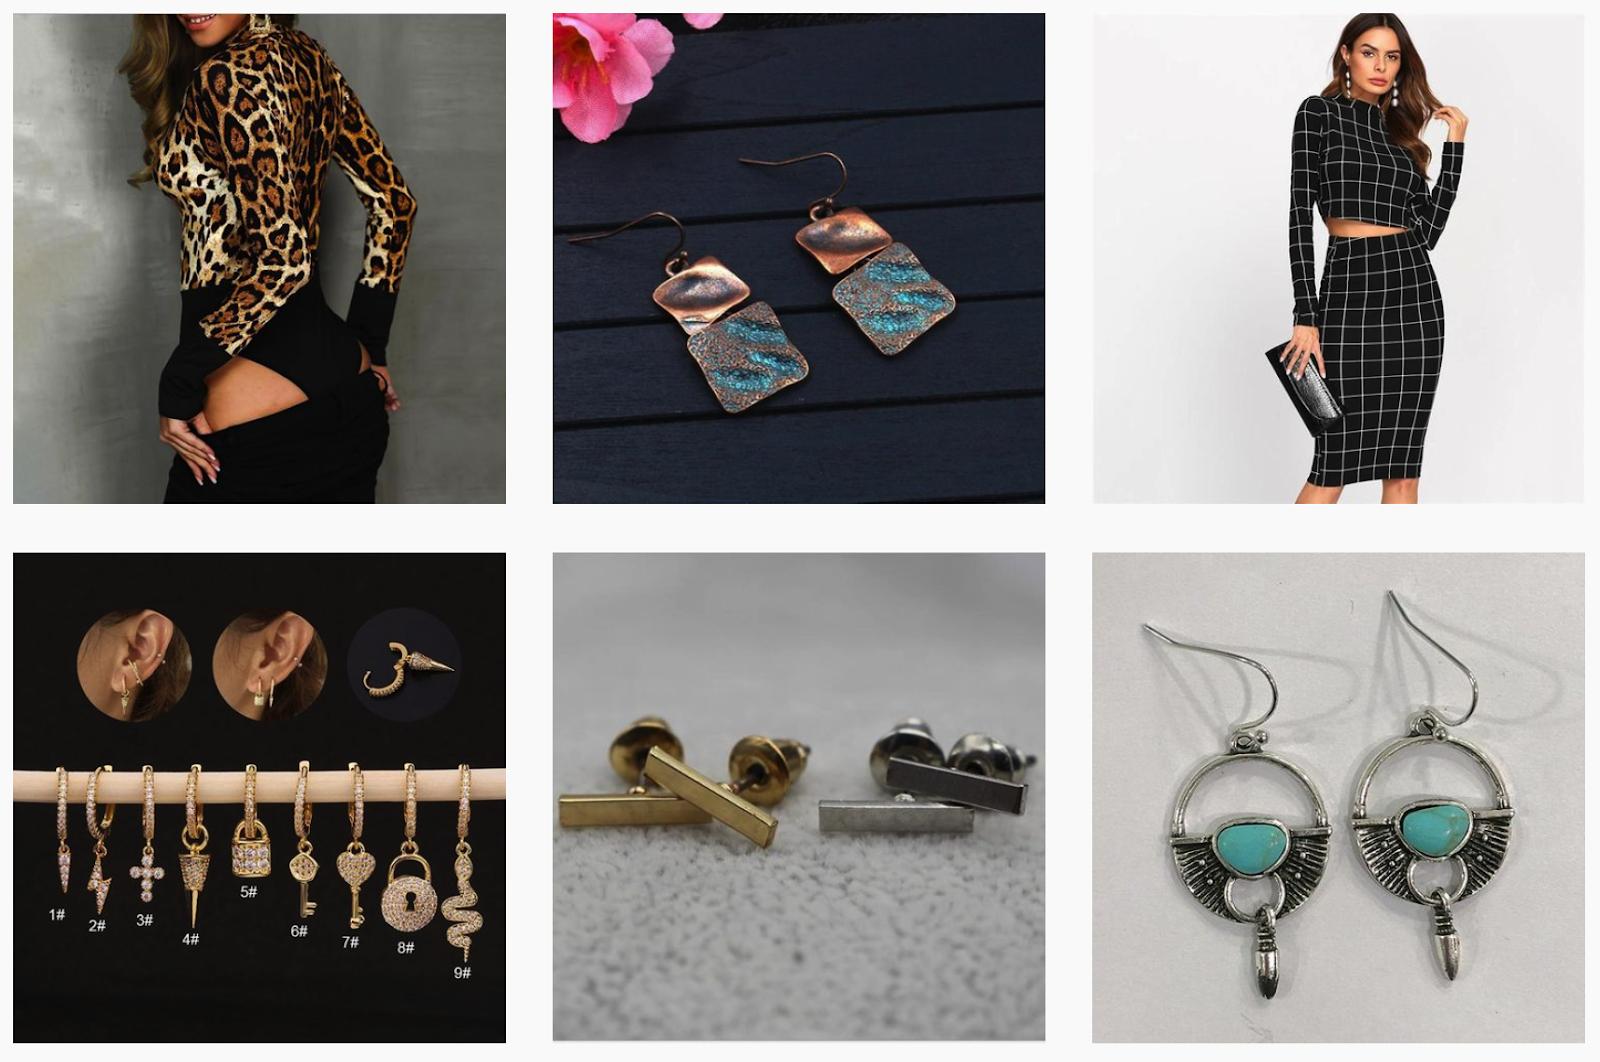 Nalora Secret | Jewelry and Clothing | Social Media Posts